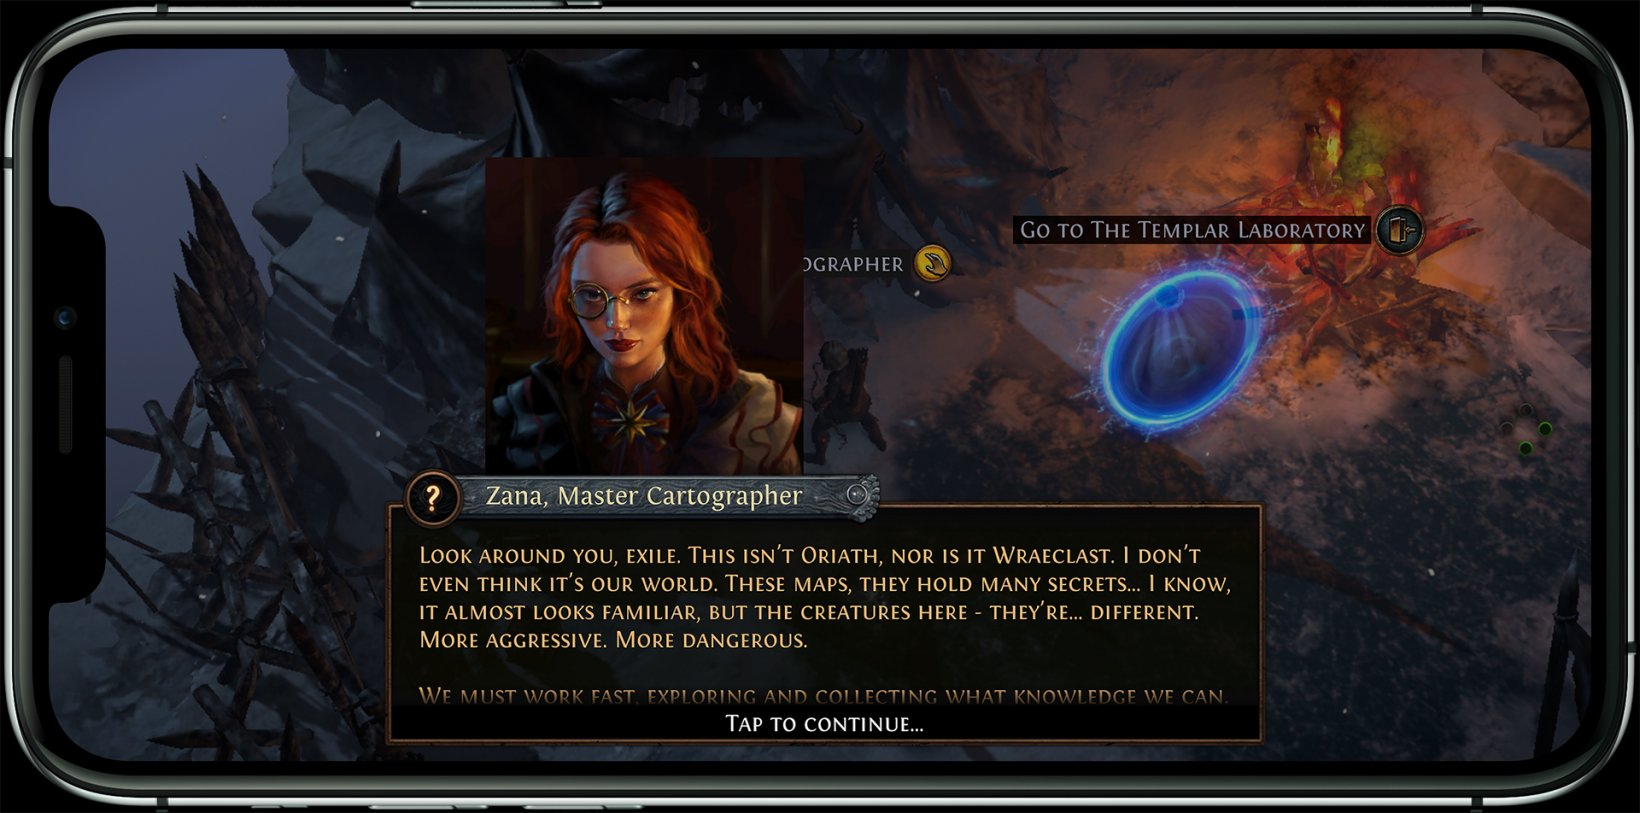 Path of Exile Mobile dialogue